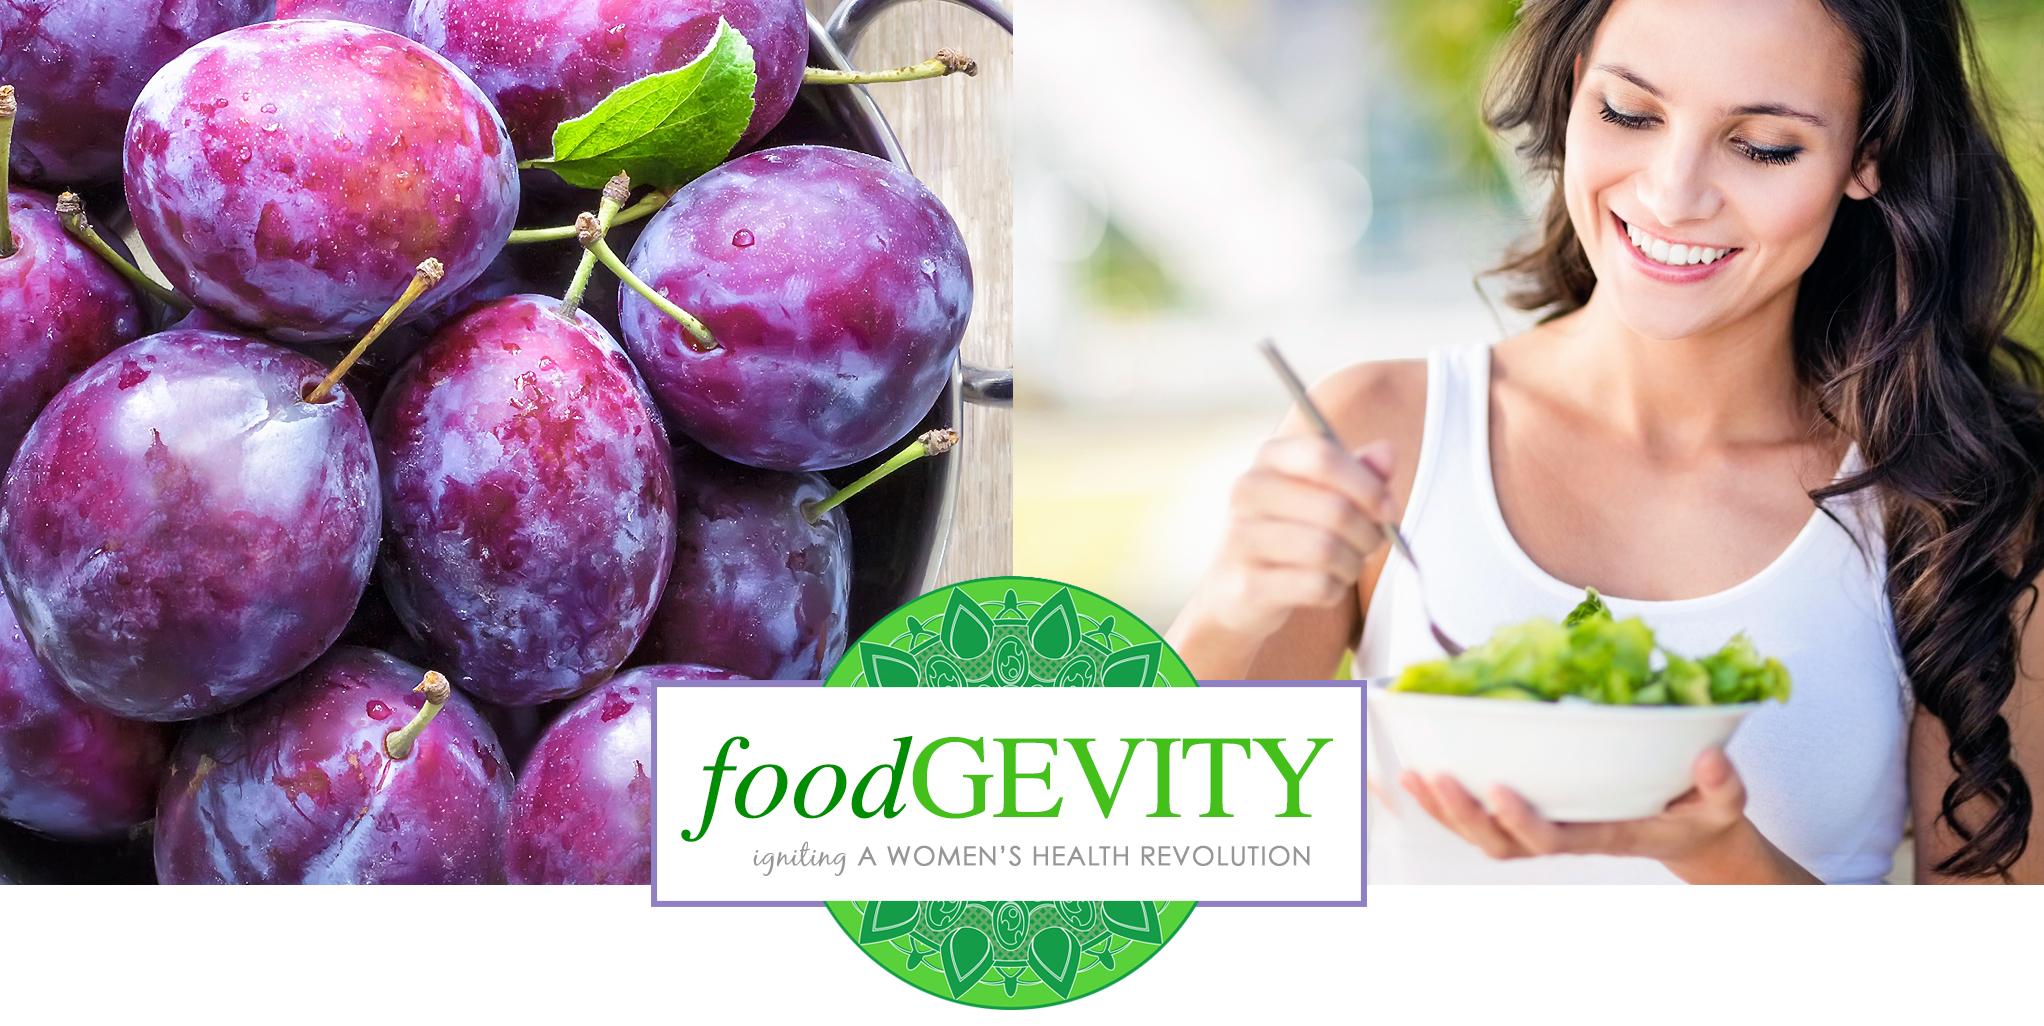 foodgevity banner for portfolio new logo.jpg